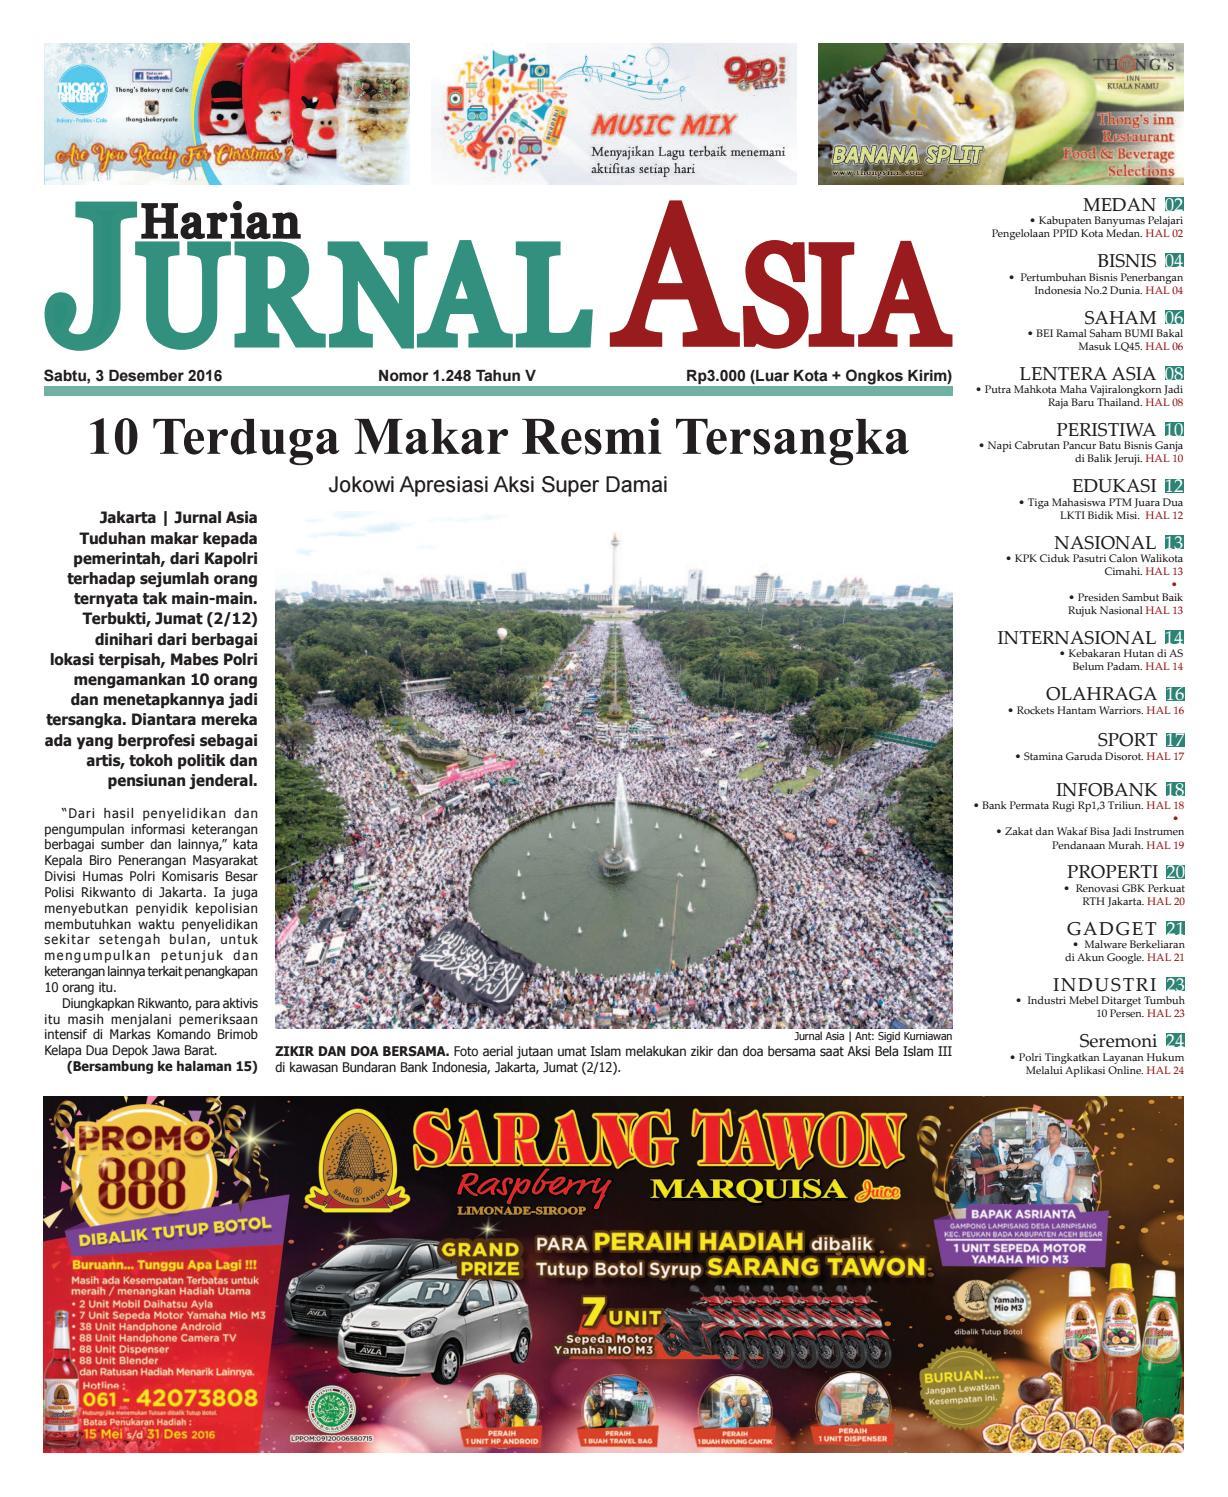 A5 retro bisnis tangan Notepad sandi ini. Source · Kewirausahaan Darmansyah Source · Harian Jurnal